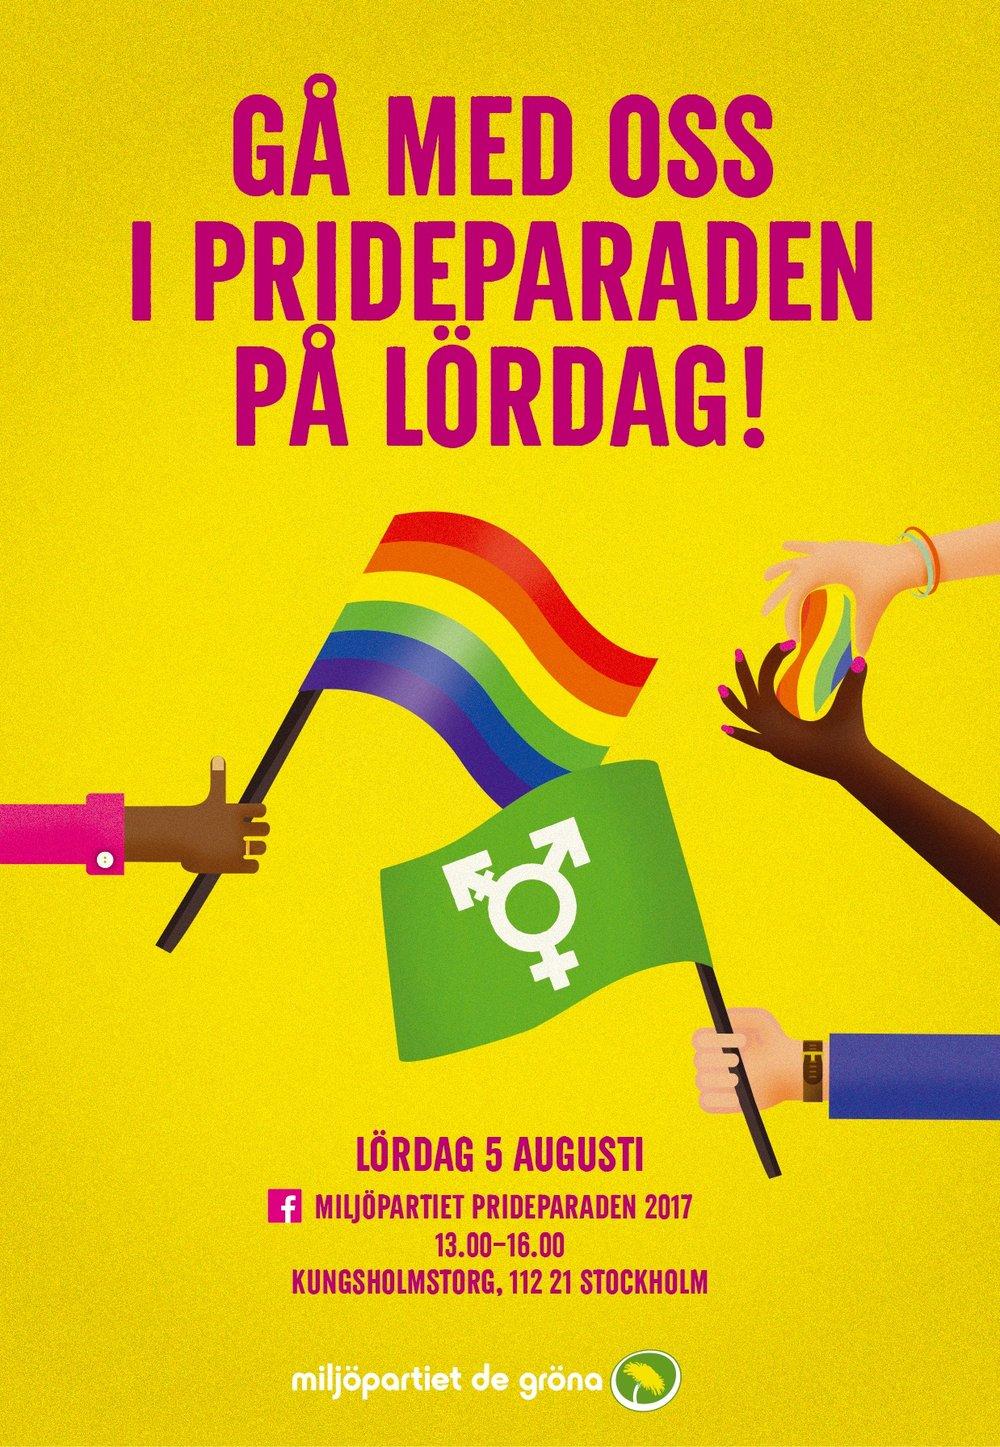 prideparaden-2017-mp.jpg